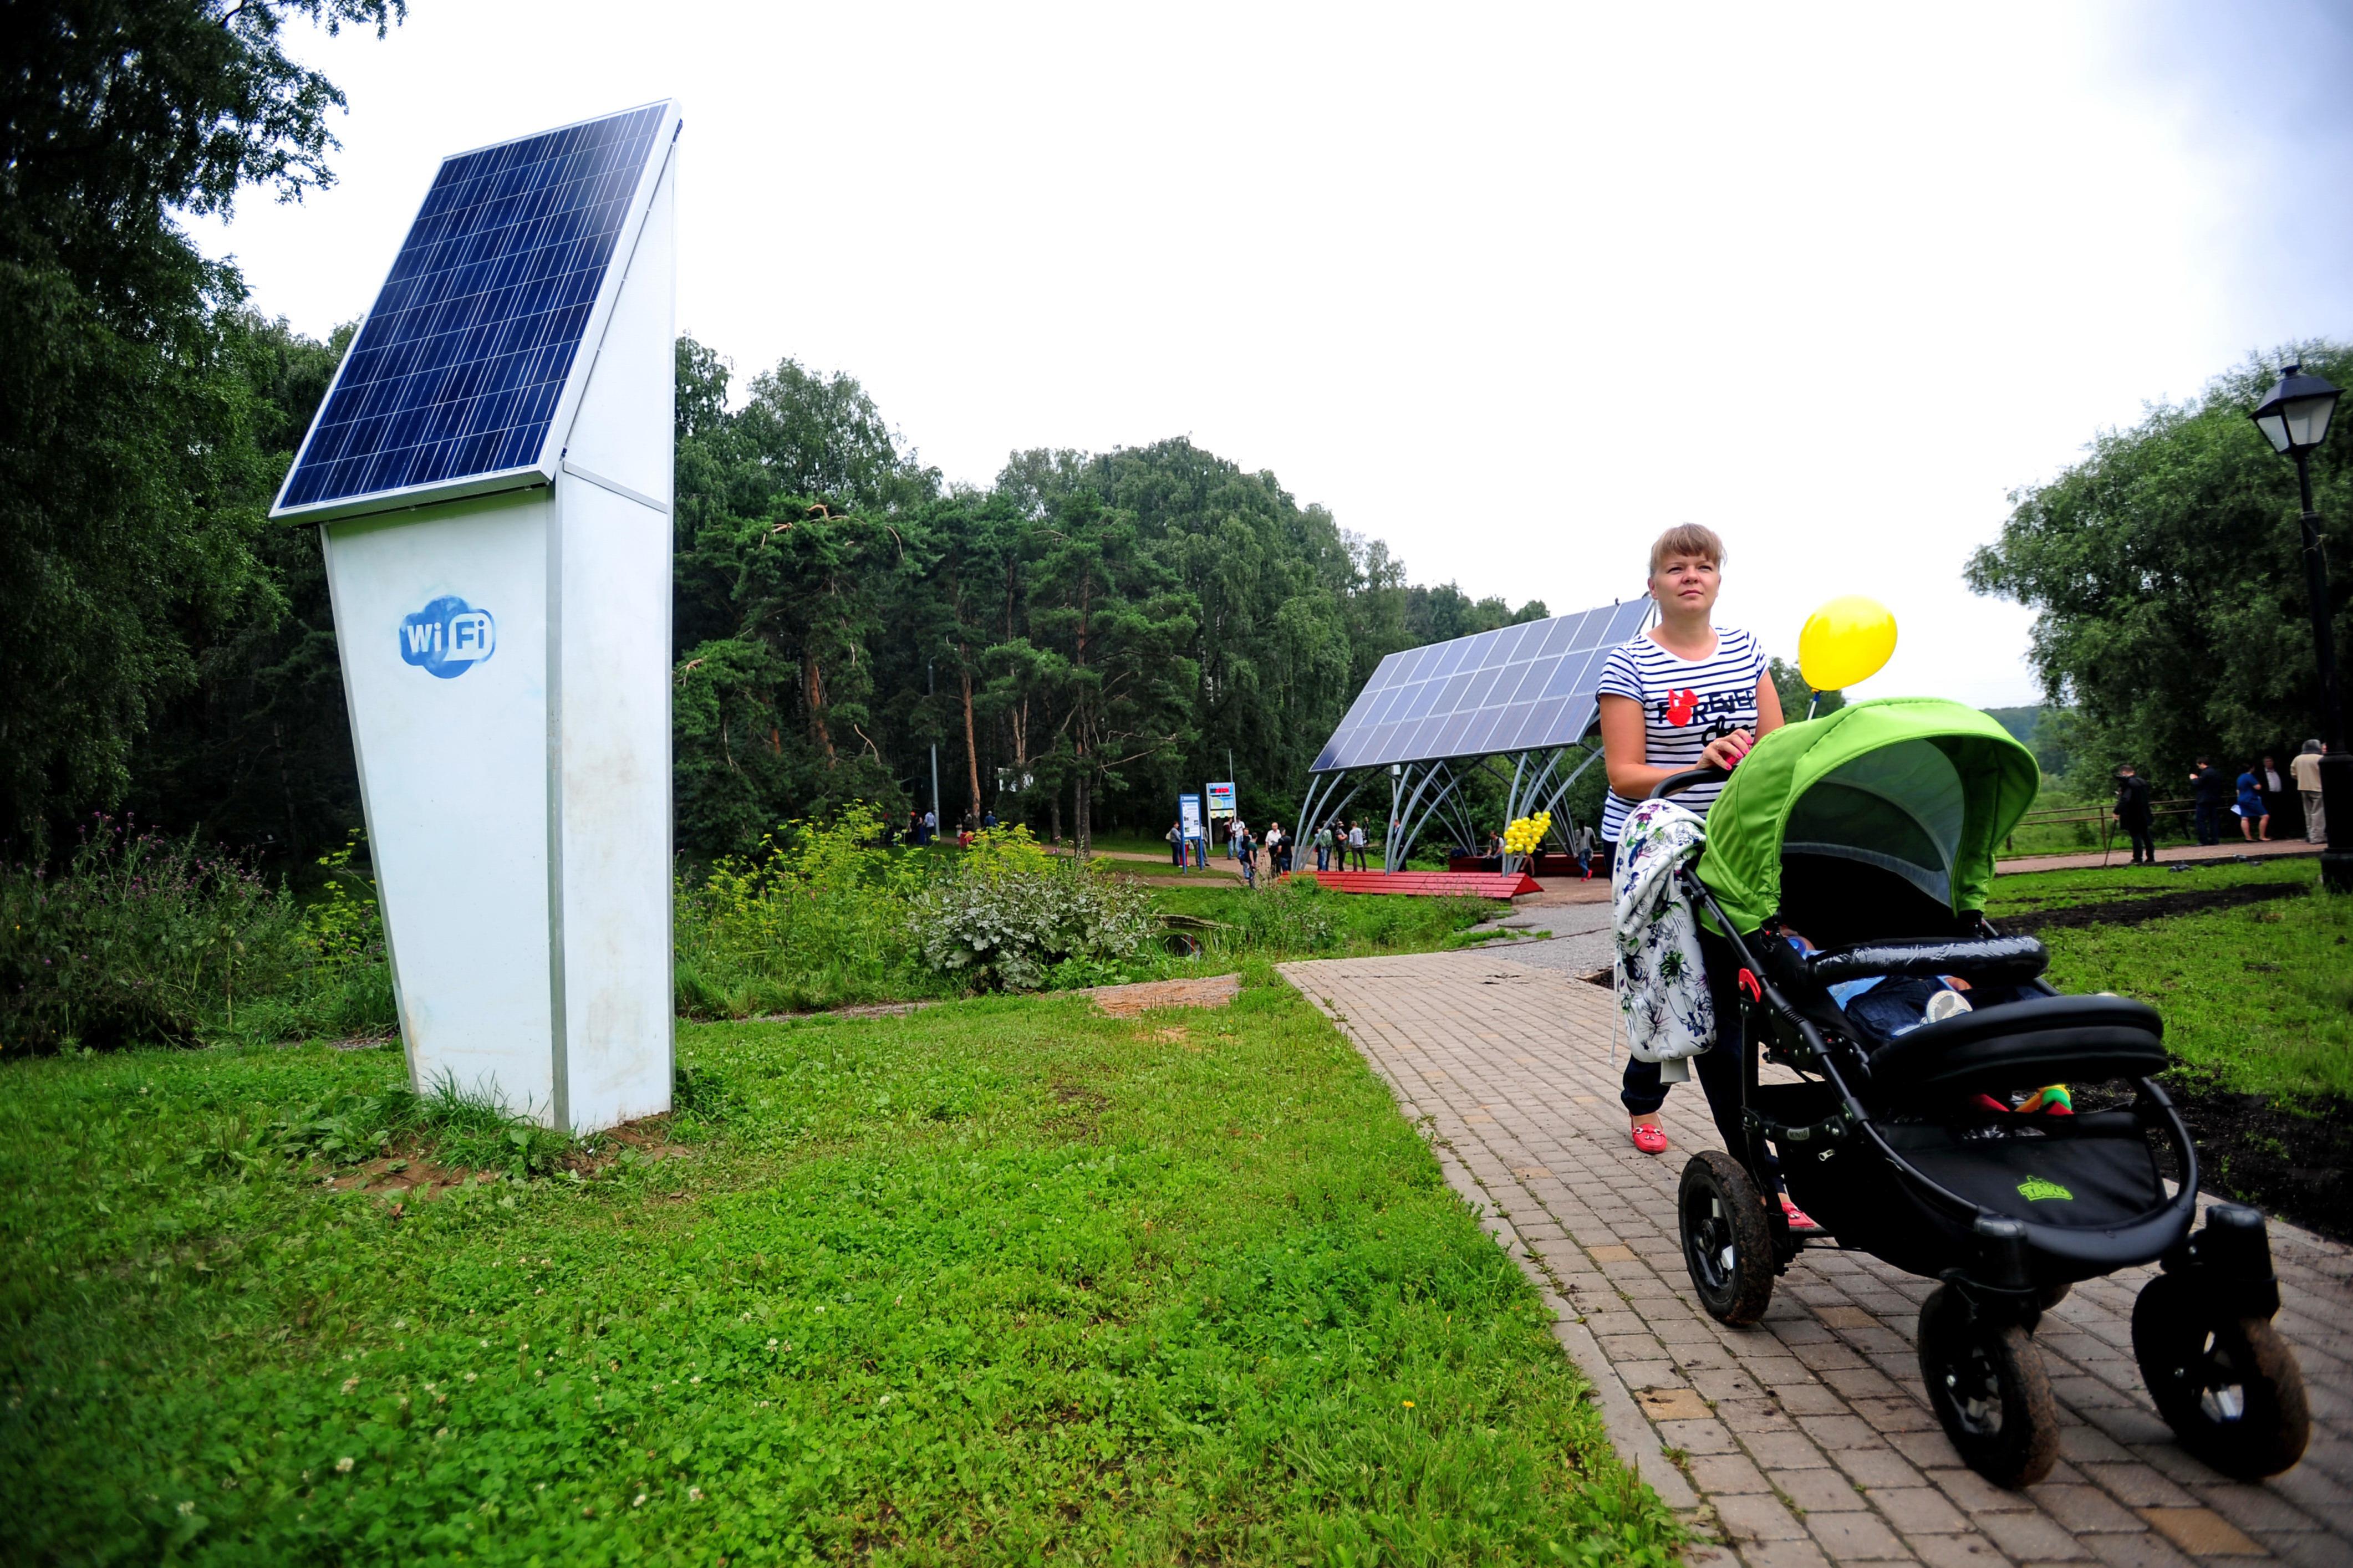 Во дворах Ставрополя появятся фонари на солнечных батареях